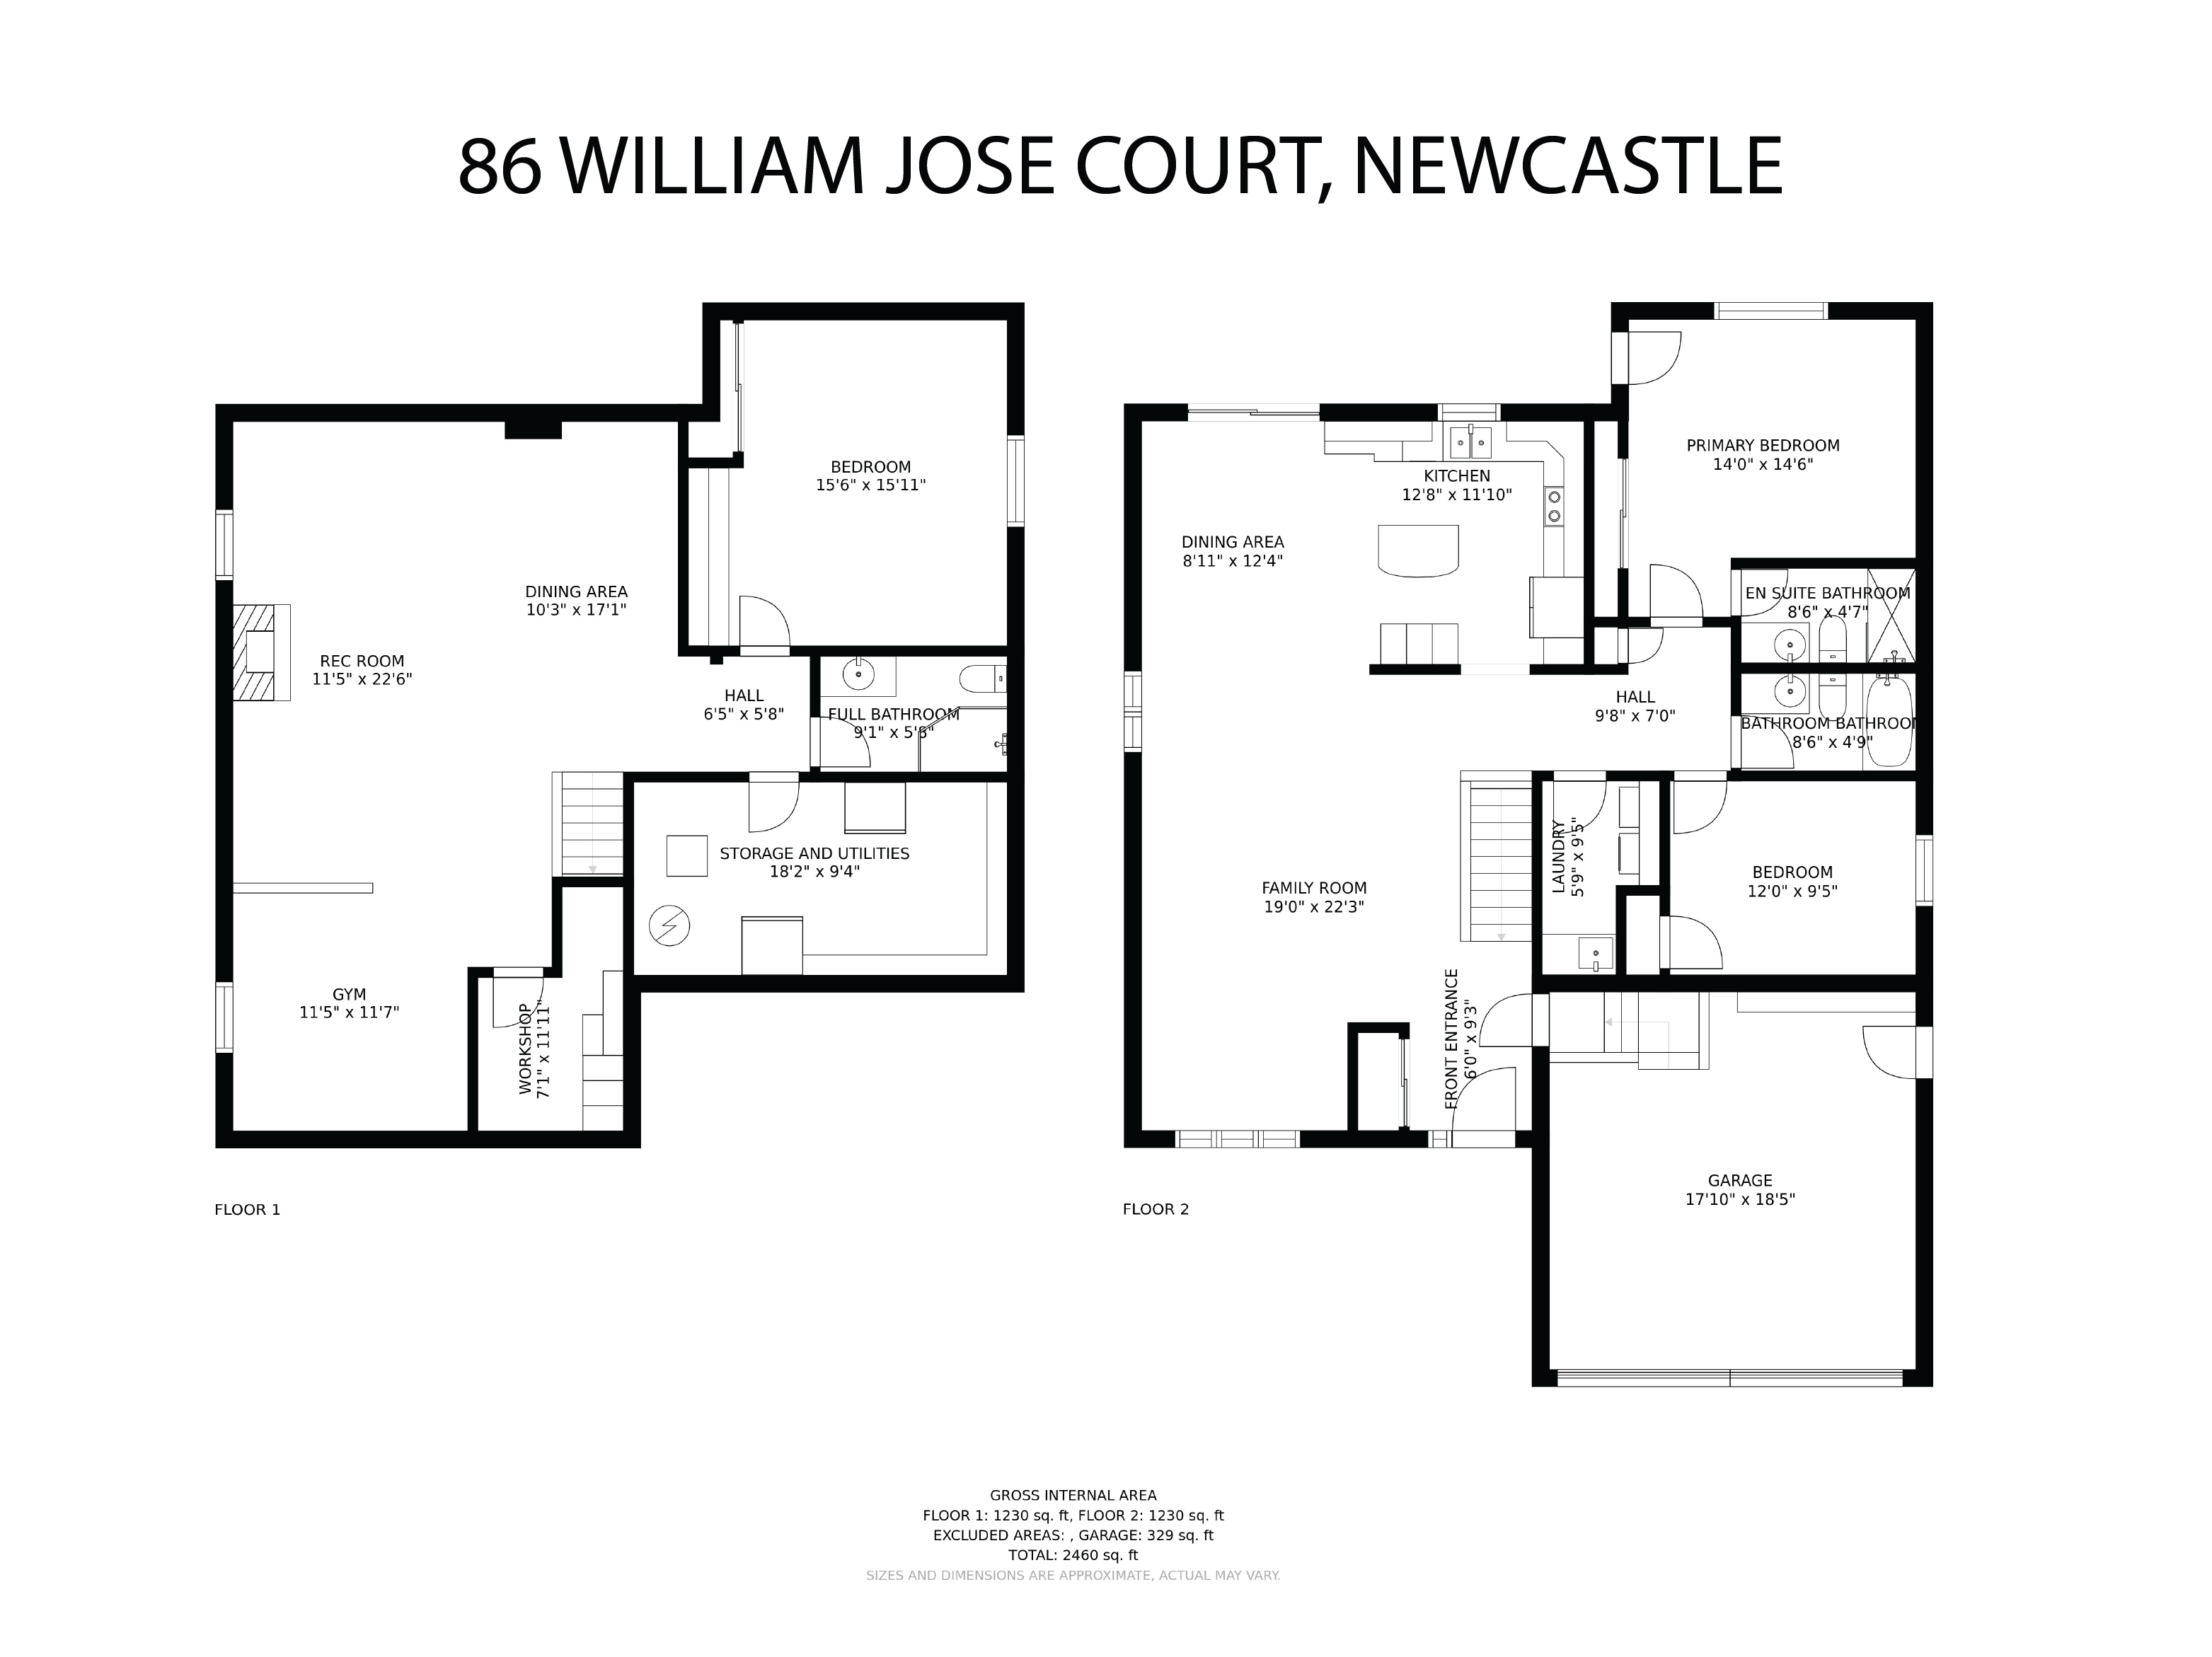 86 William Jose Court floorplan